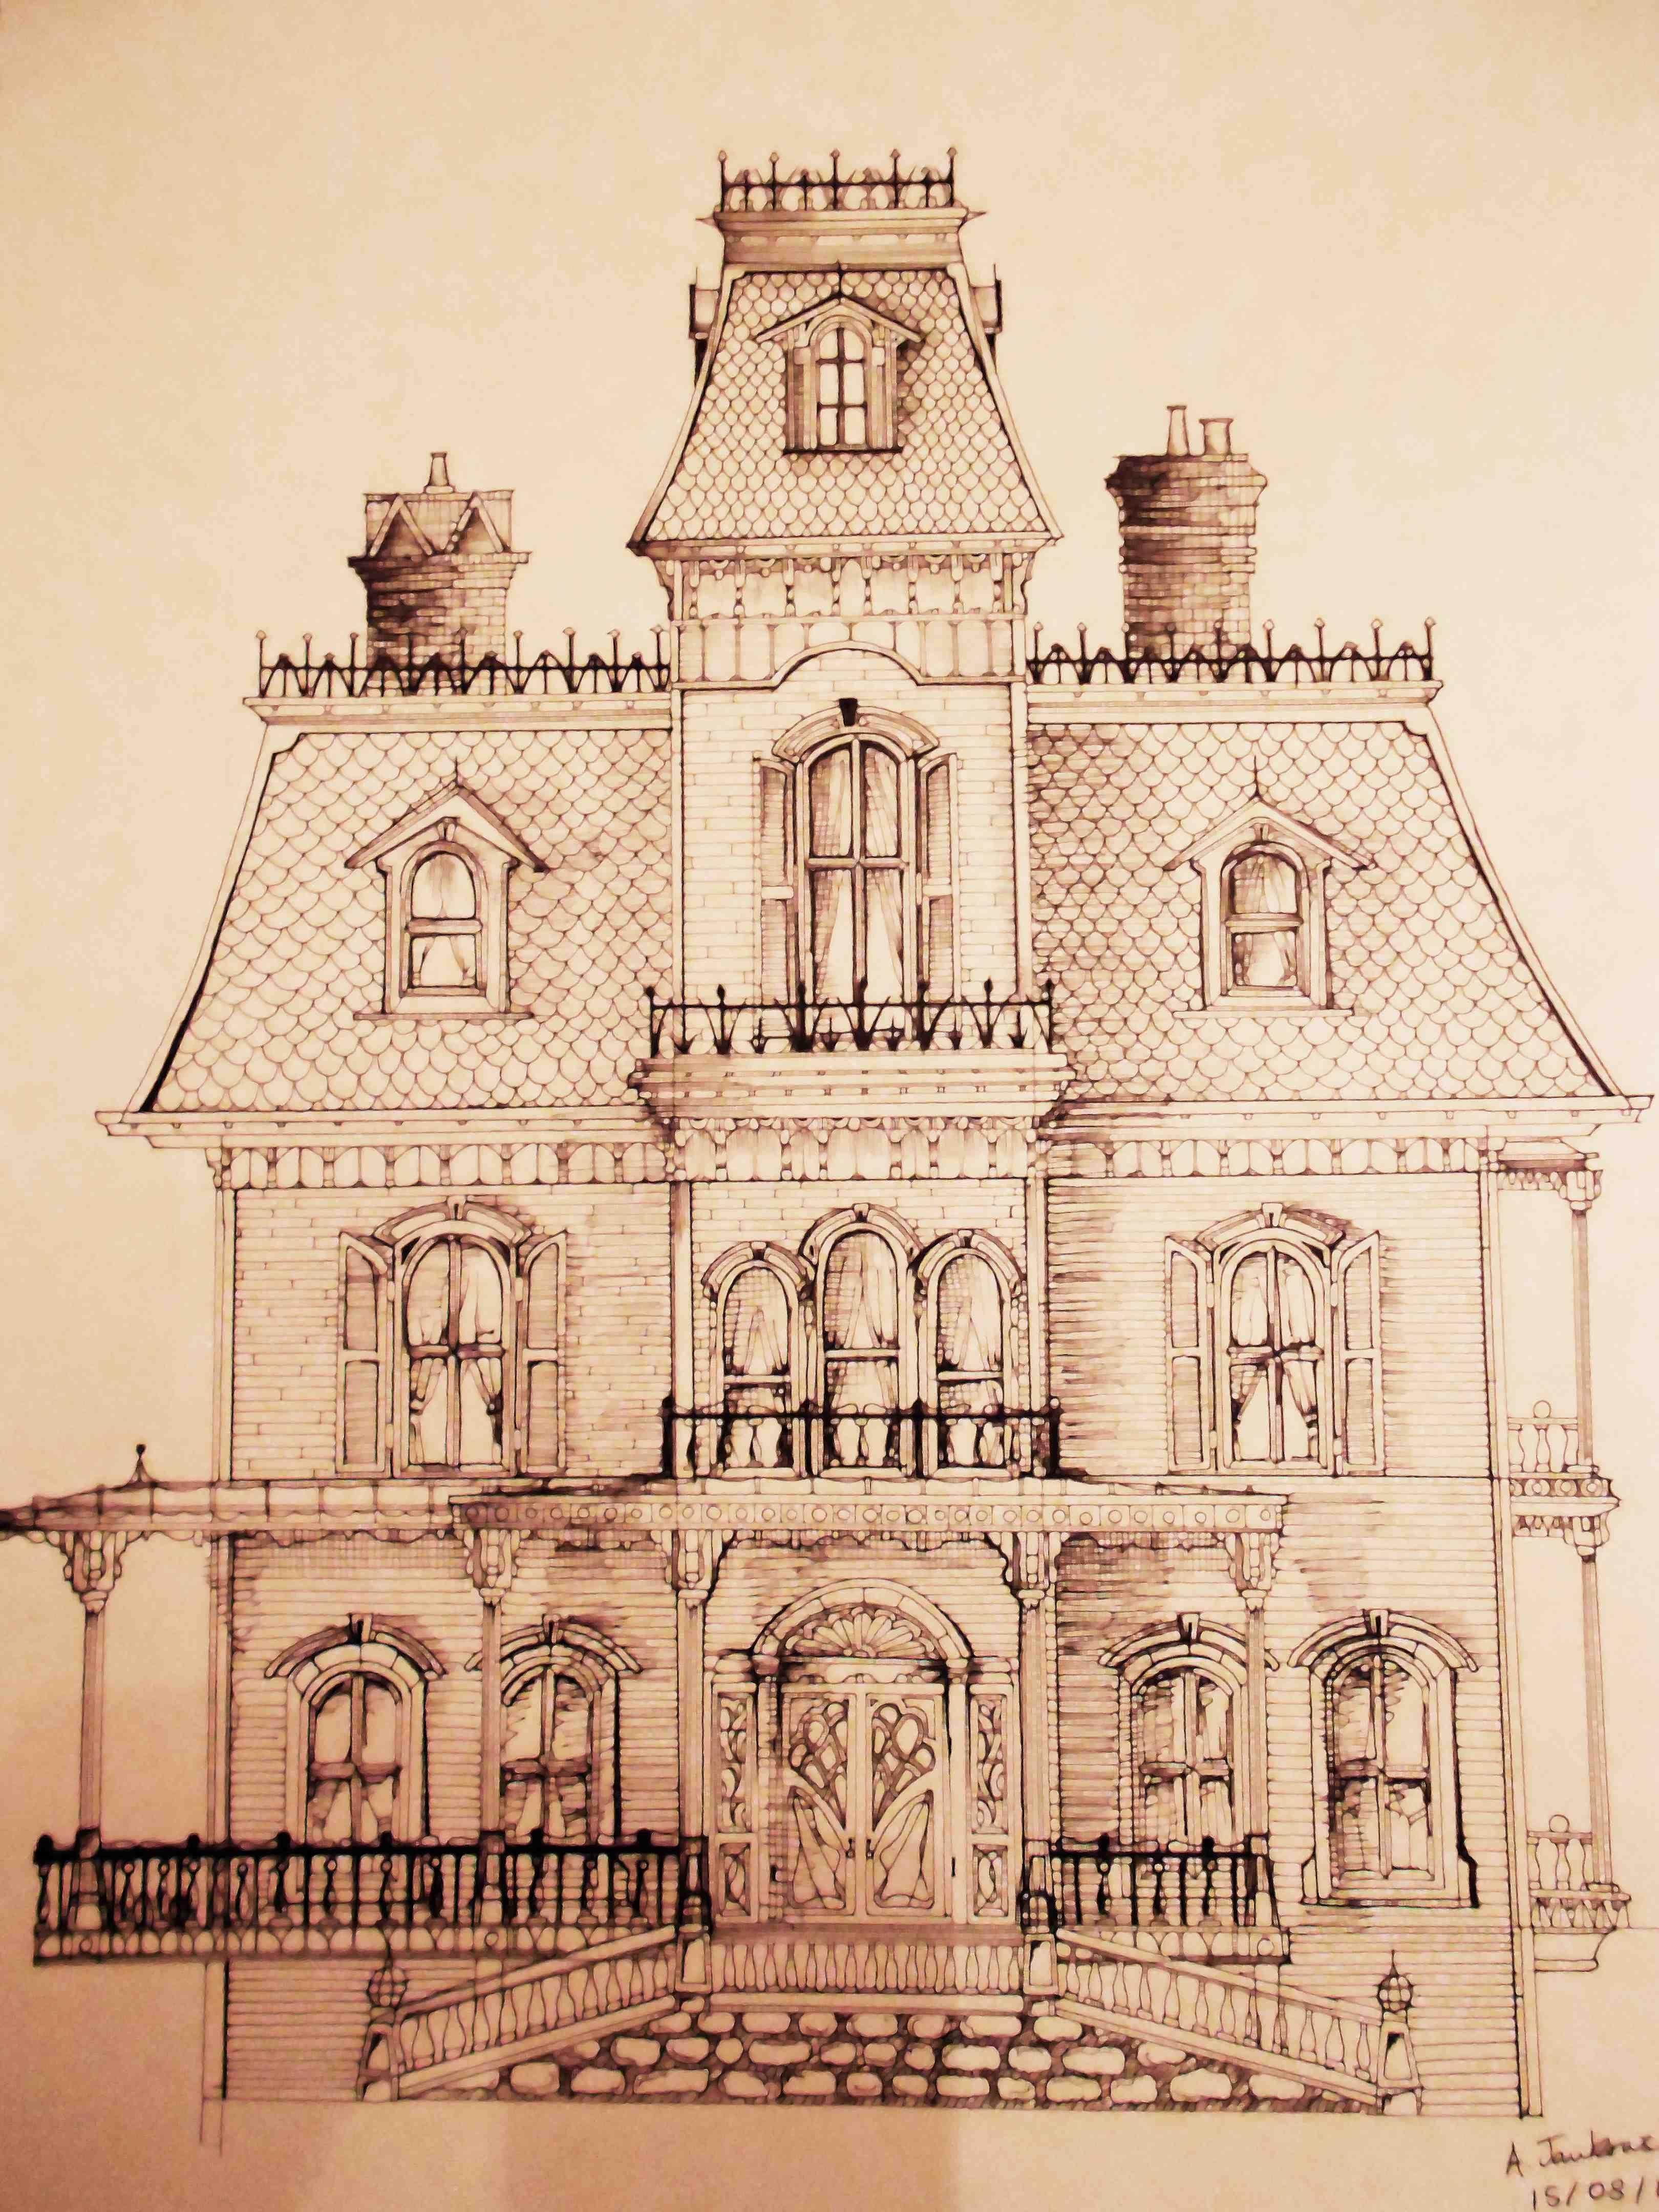 Manor House Drawing: Phantom Manor Disneyland Paris Sketch